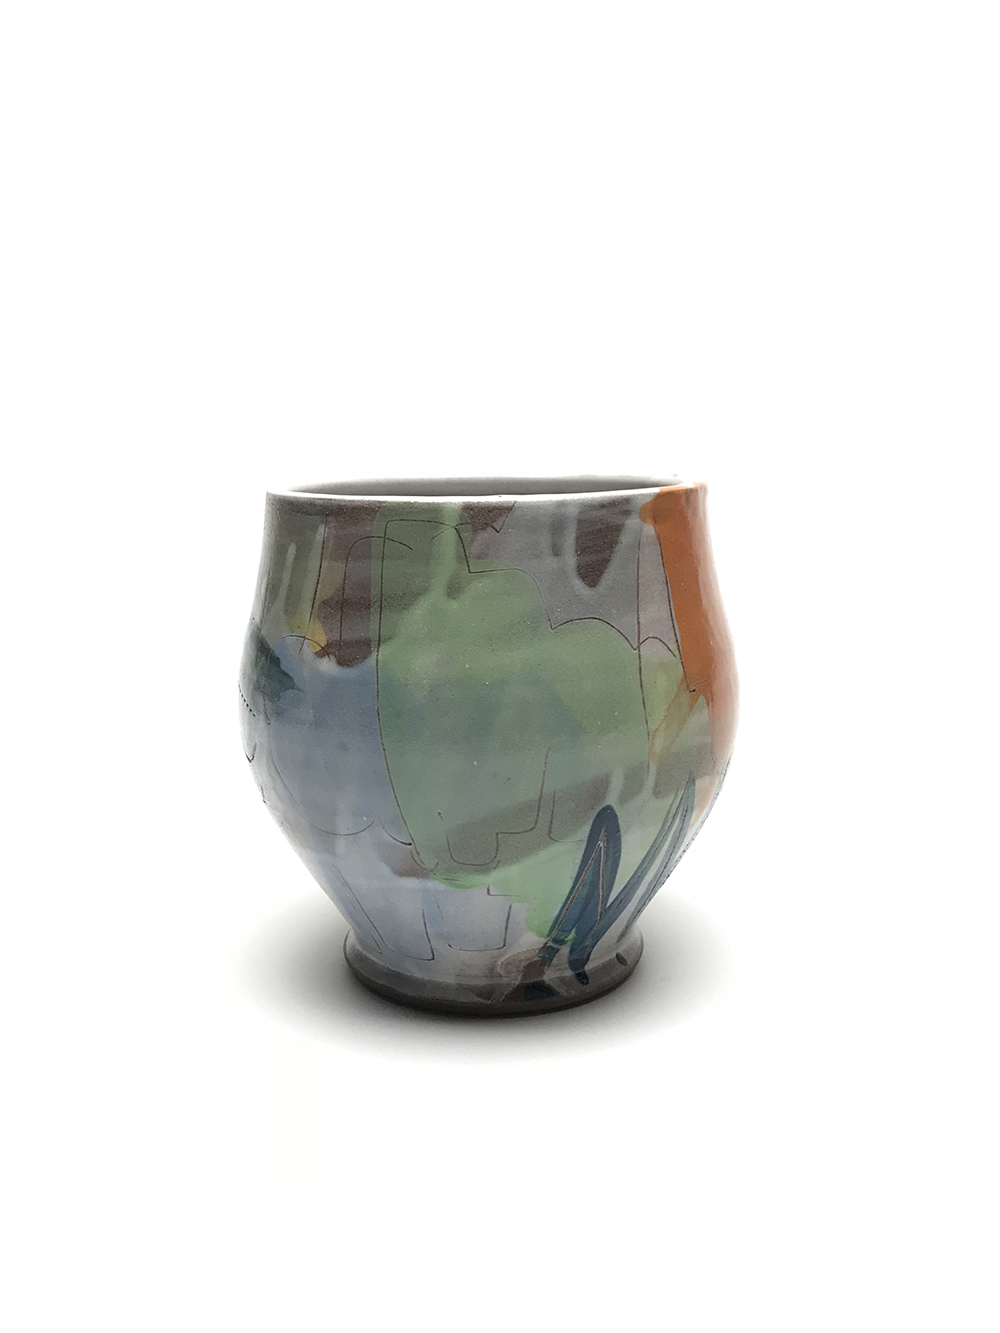 Teabowl, Earthen red clay, slips, underglaze, glaze, 2018.